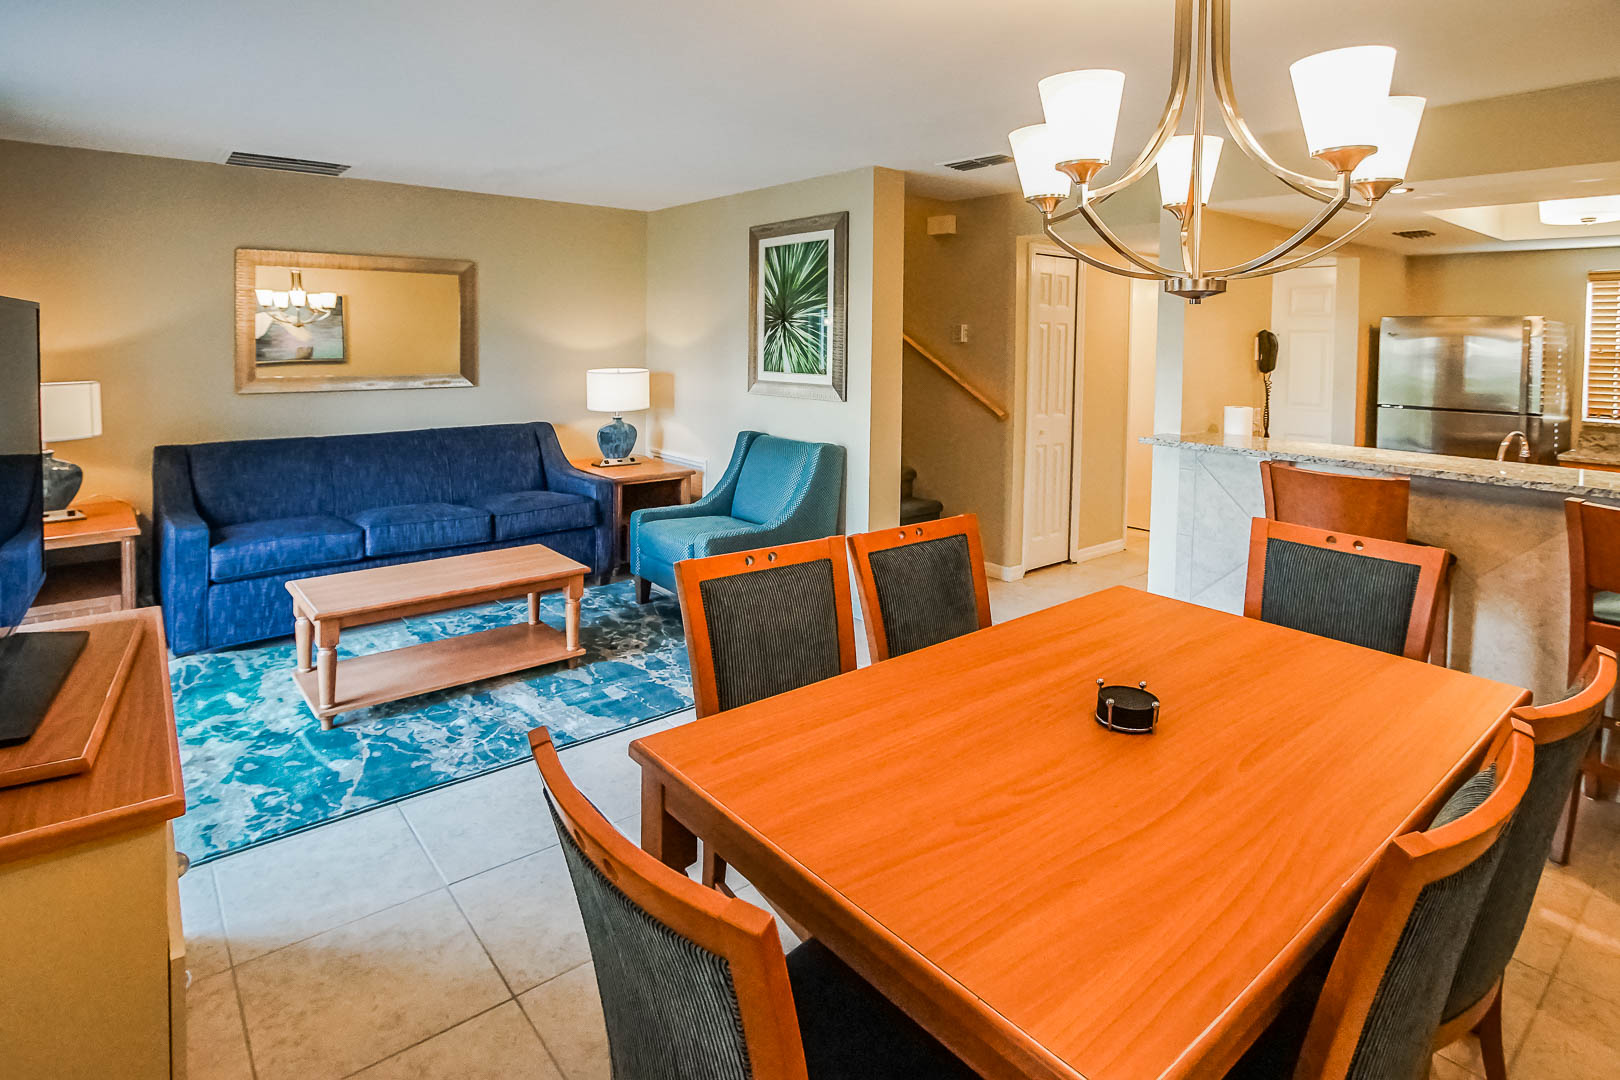 A modern living room at VRI's Fantasy World Resort in Florida.